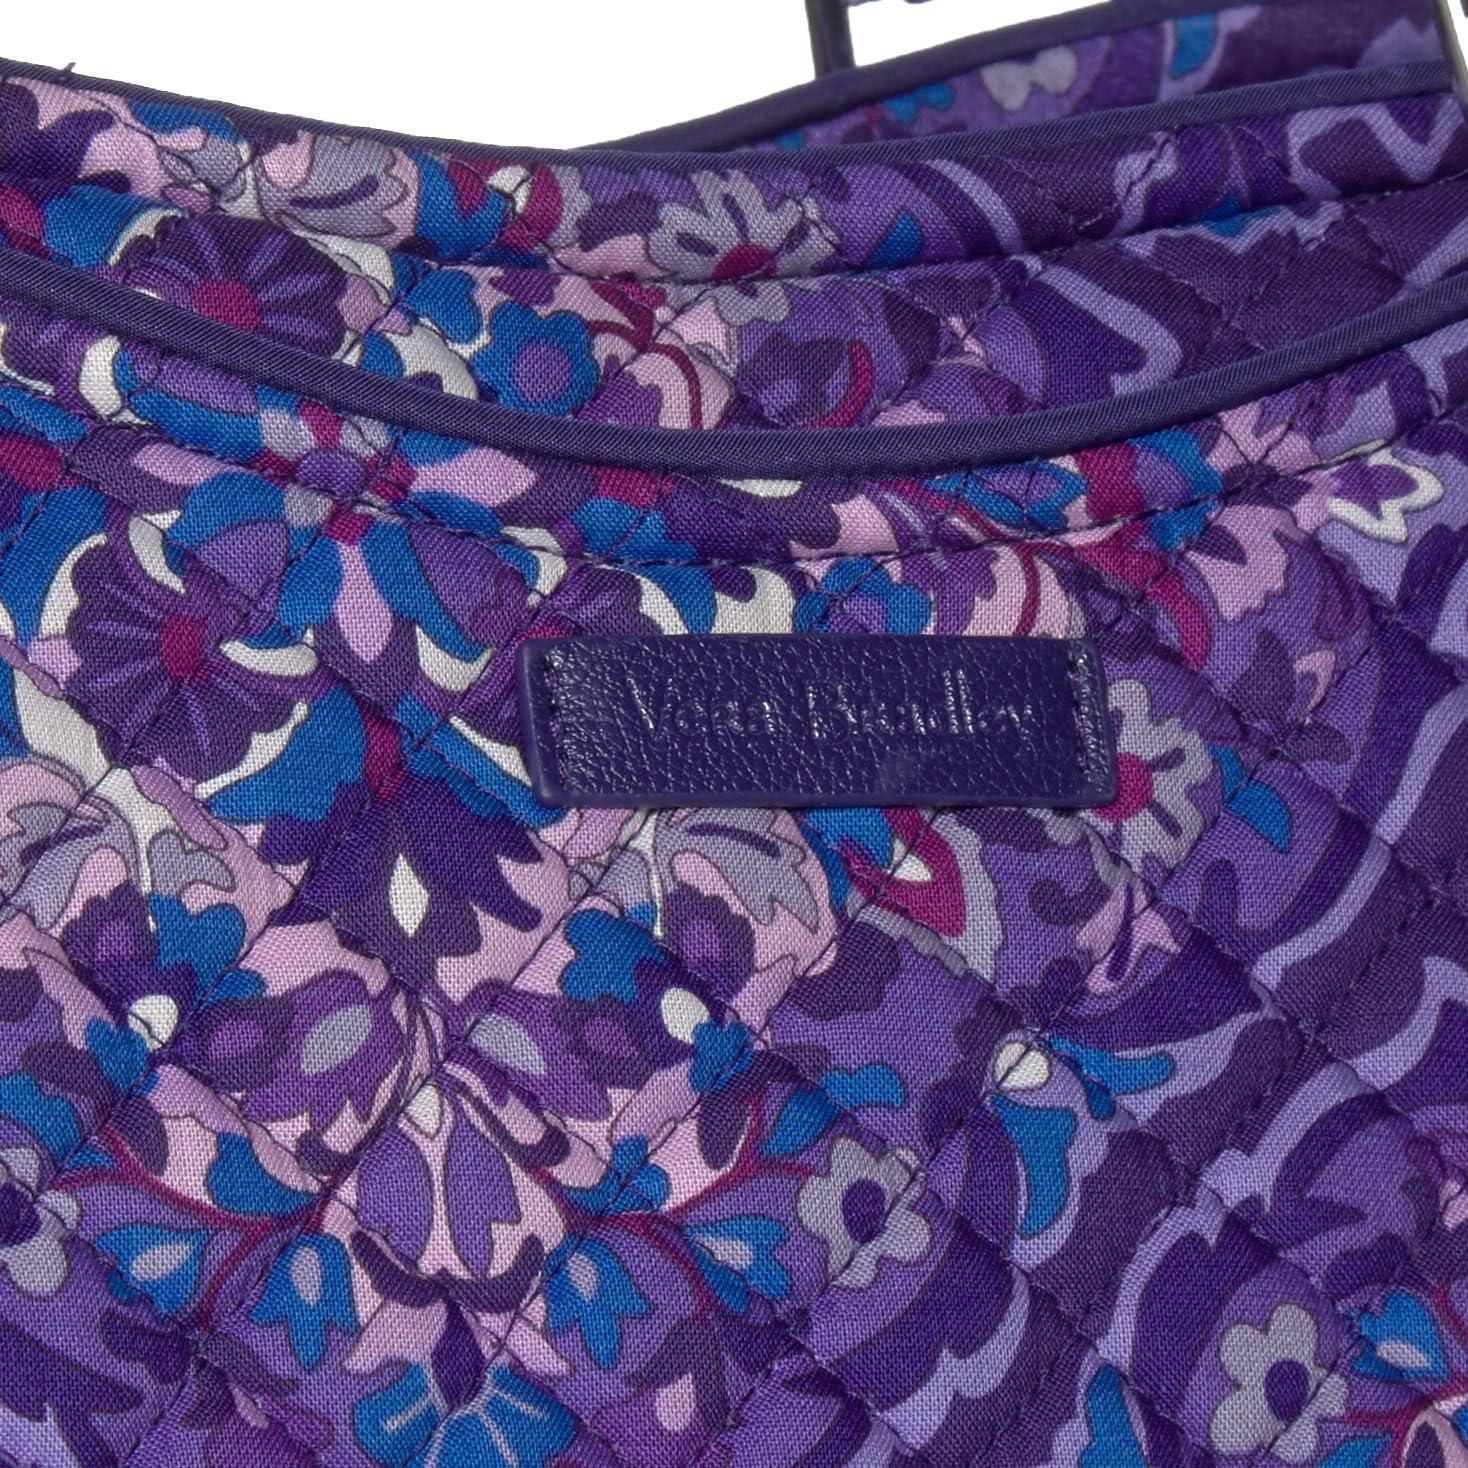 Vera Bradley Women's Iconic Signature Cotton Glenna Satchel Purse, Desert Floral, One Size Regal Rosette